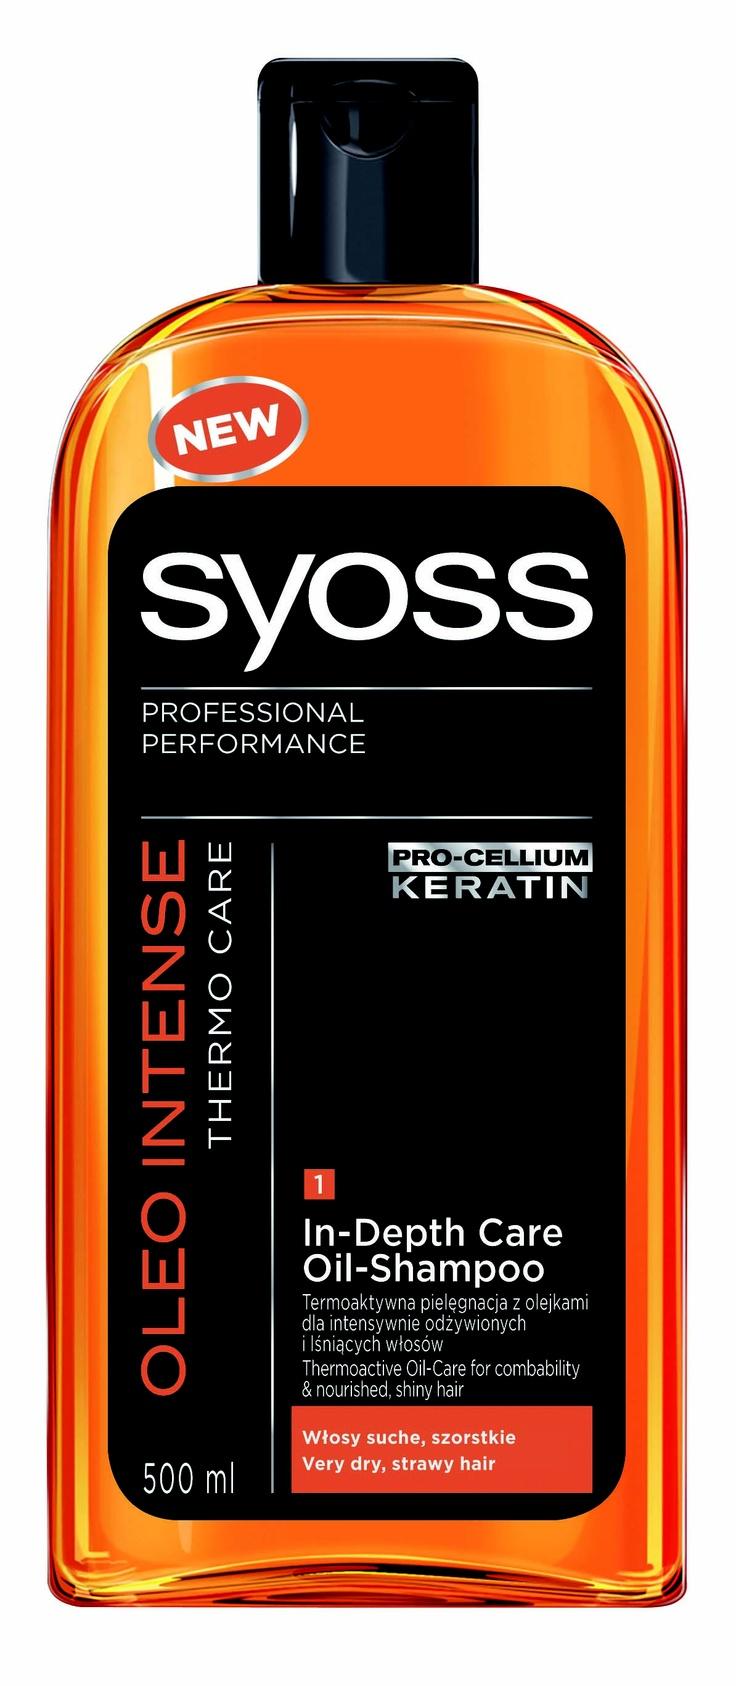 Syoss Oleo Intense szampon